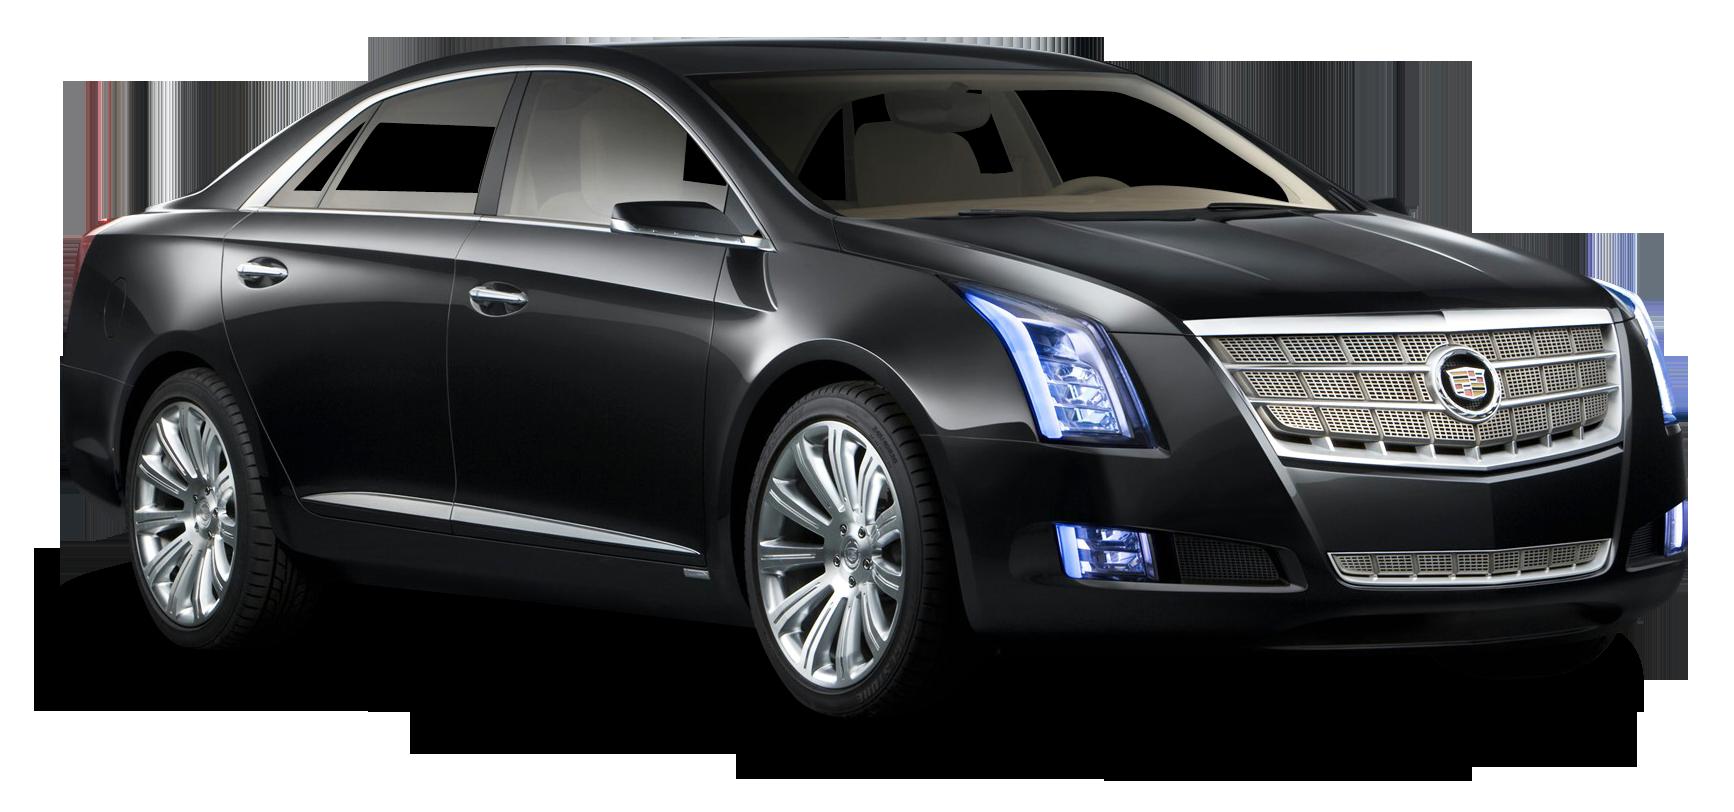 Black Cadillac XTS Platinum Car